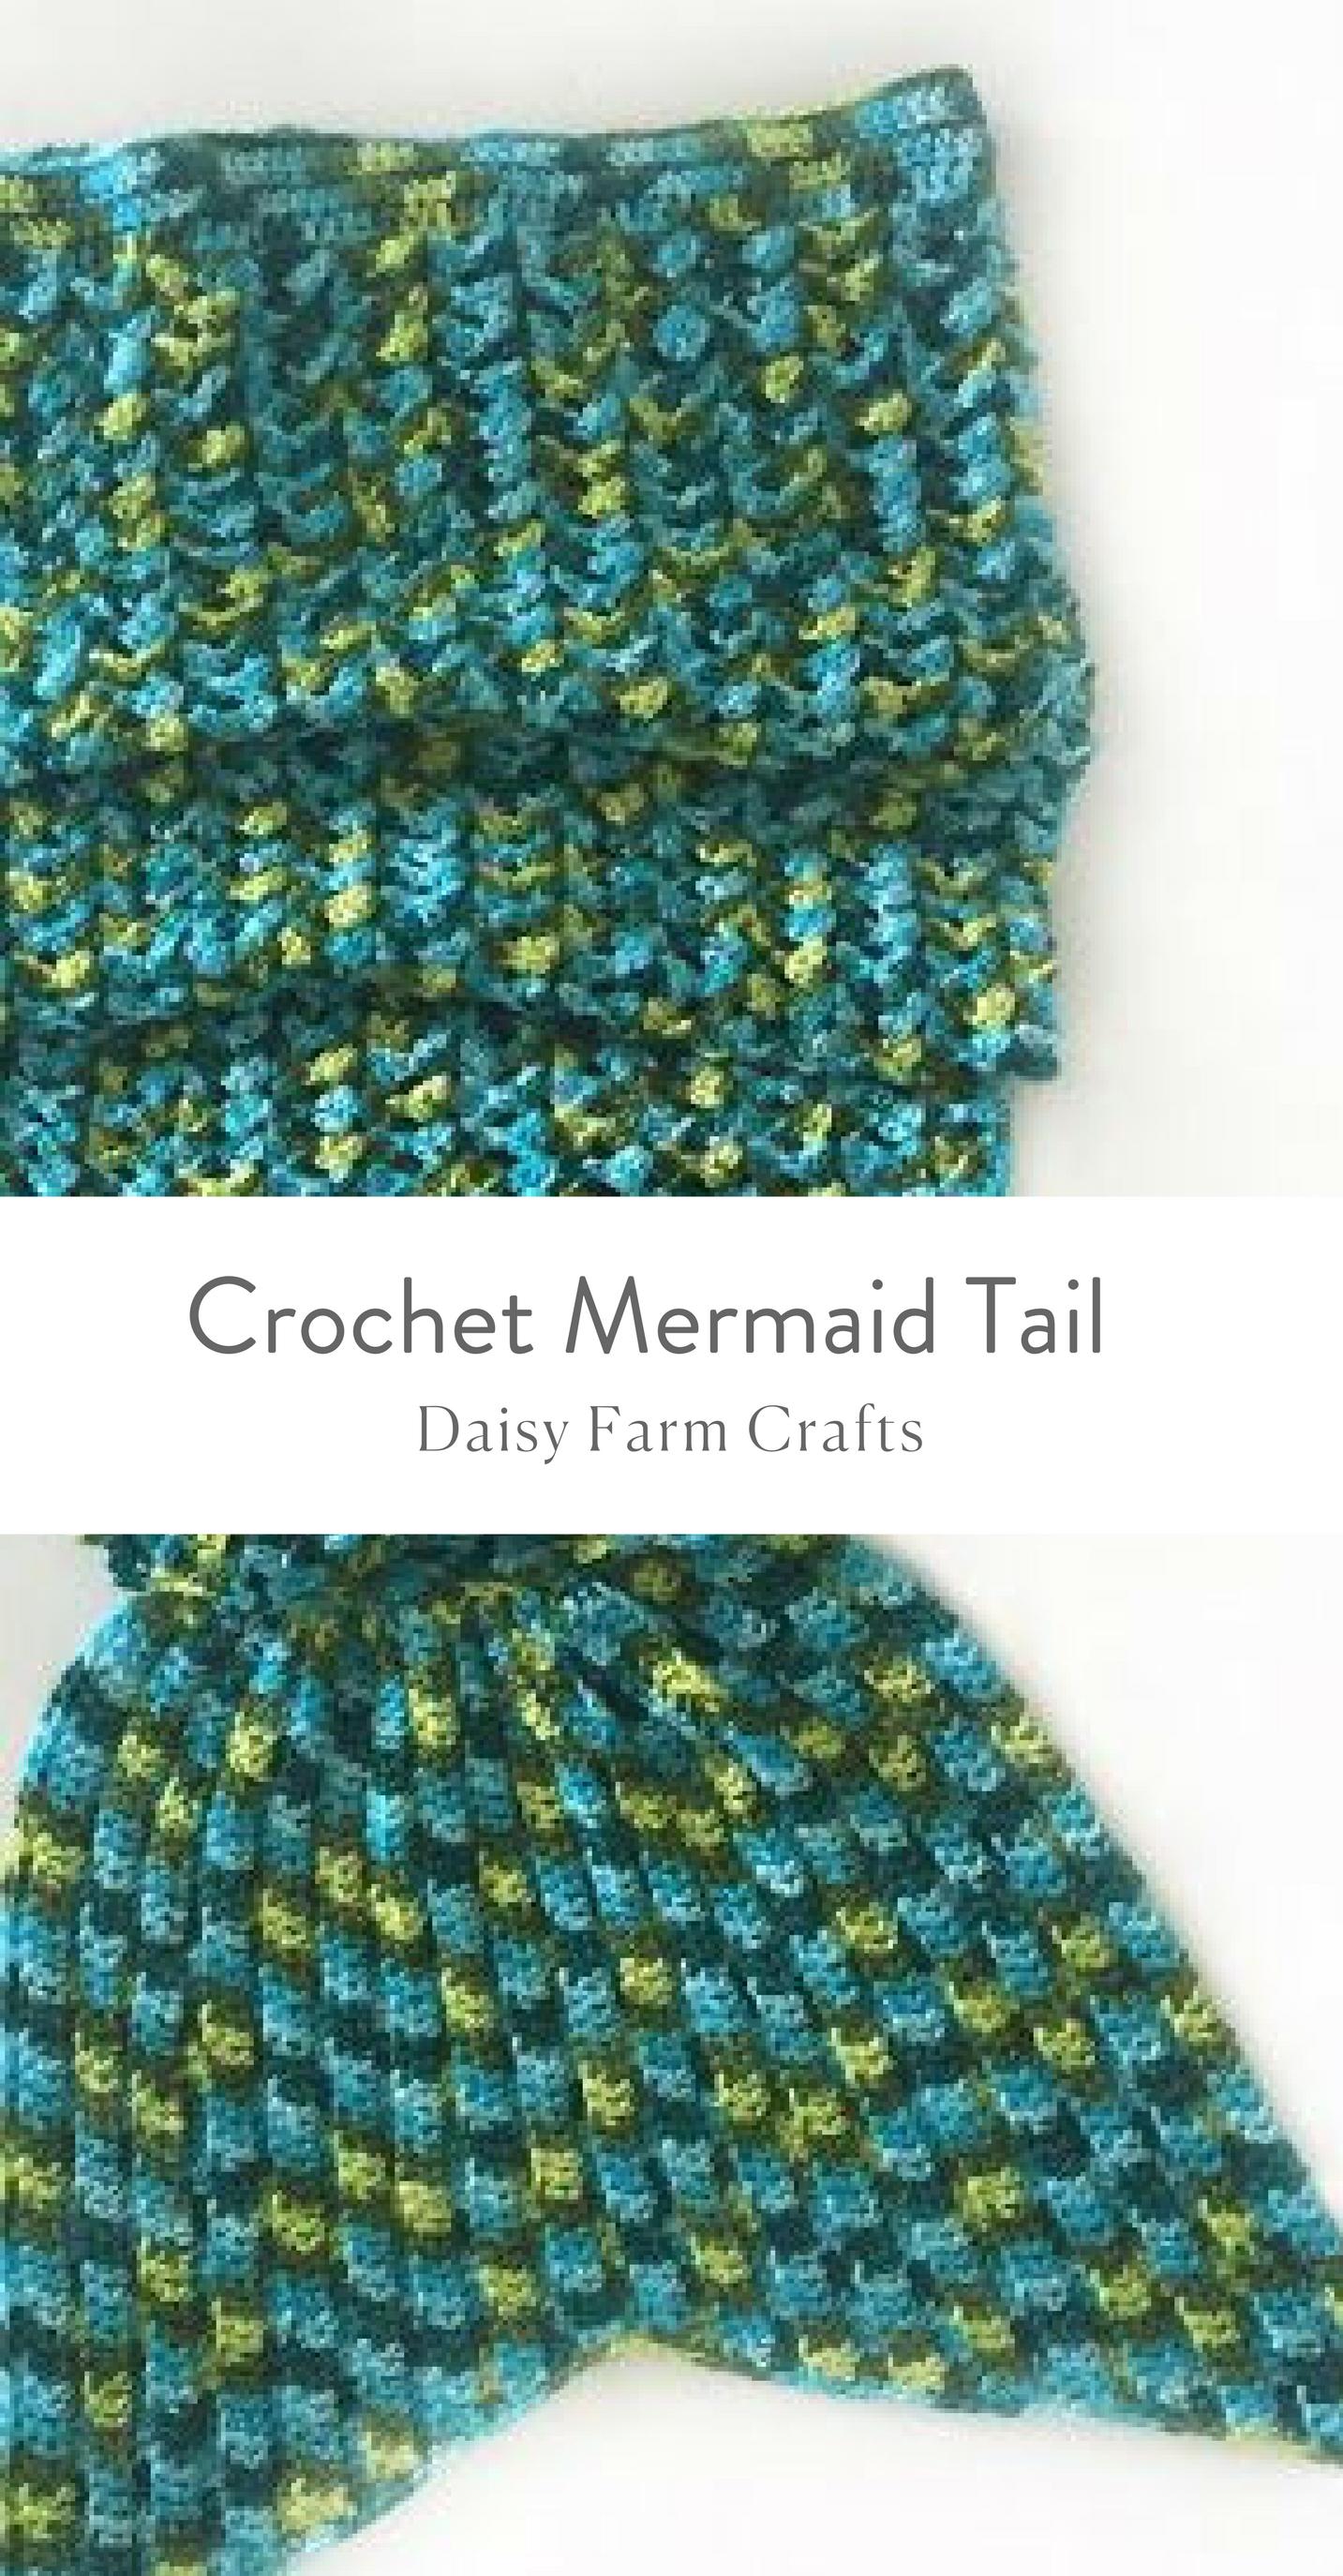 Free Pattern - Crochet Mermaid Tail | crochet & knitting | Pinterest ...